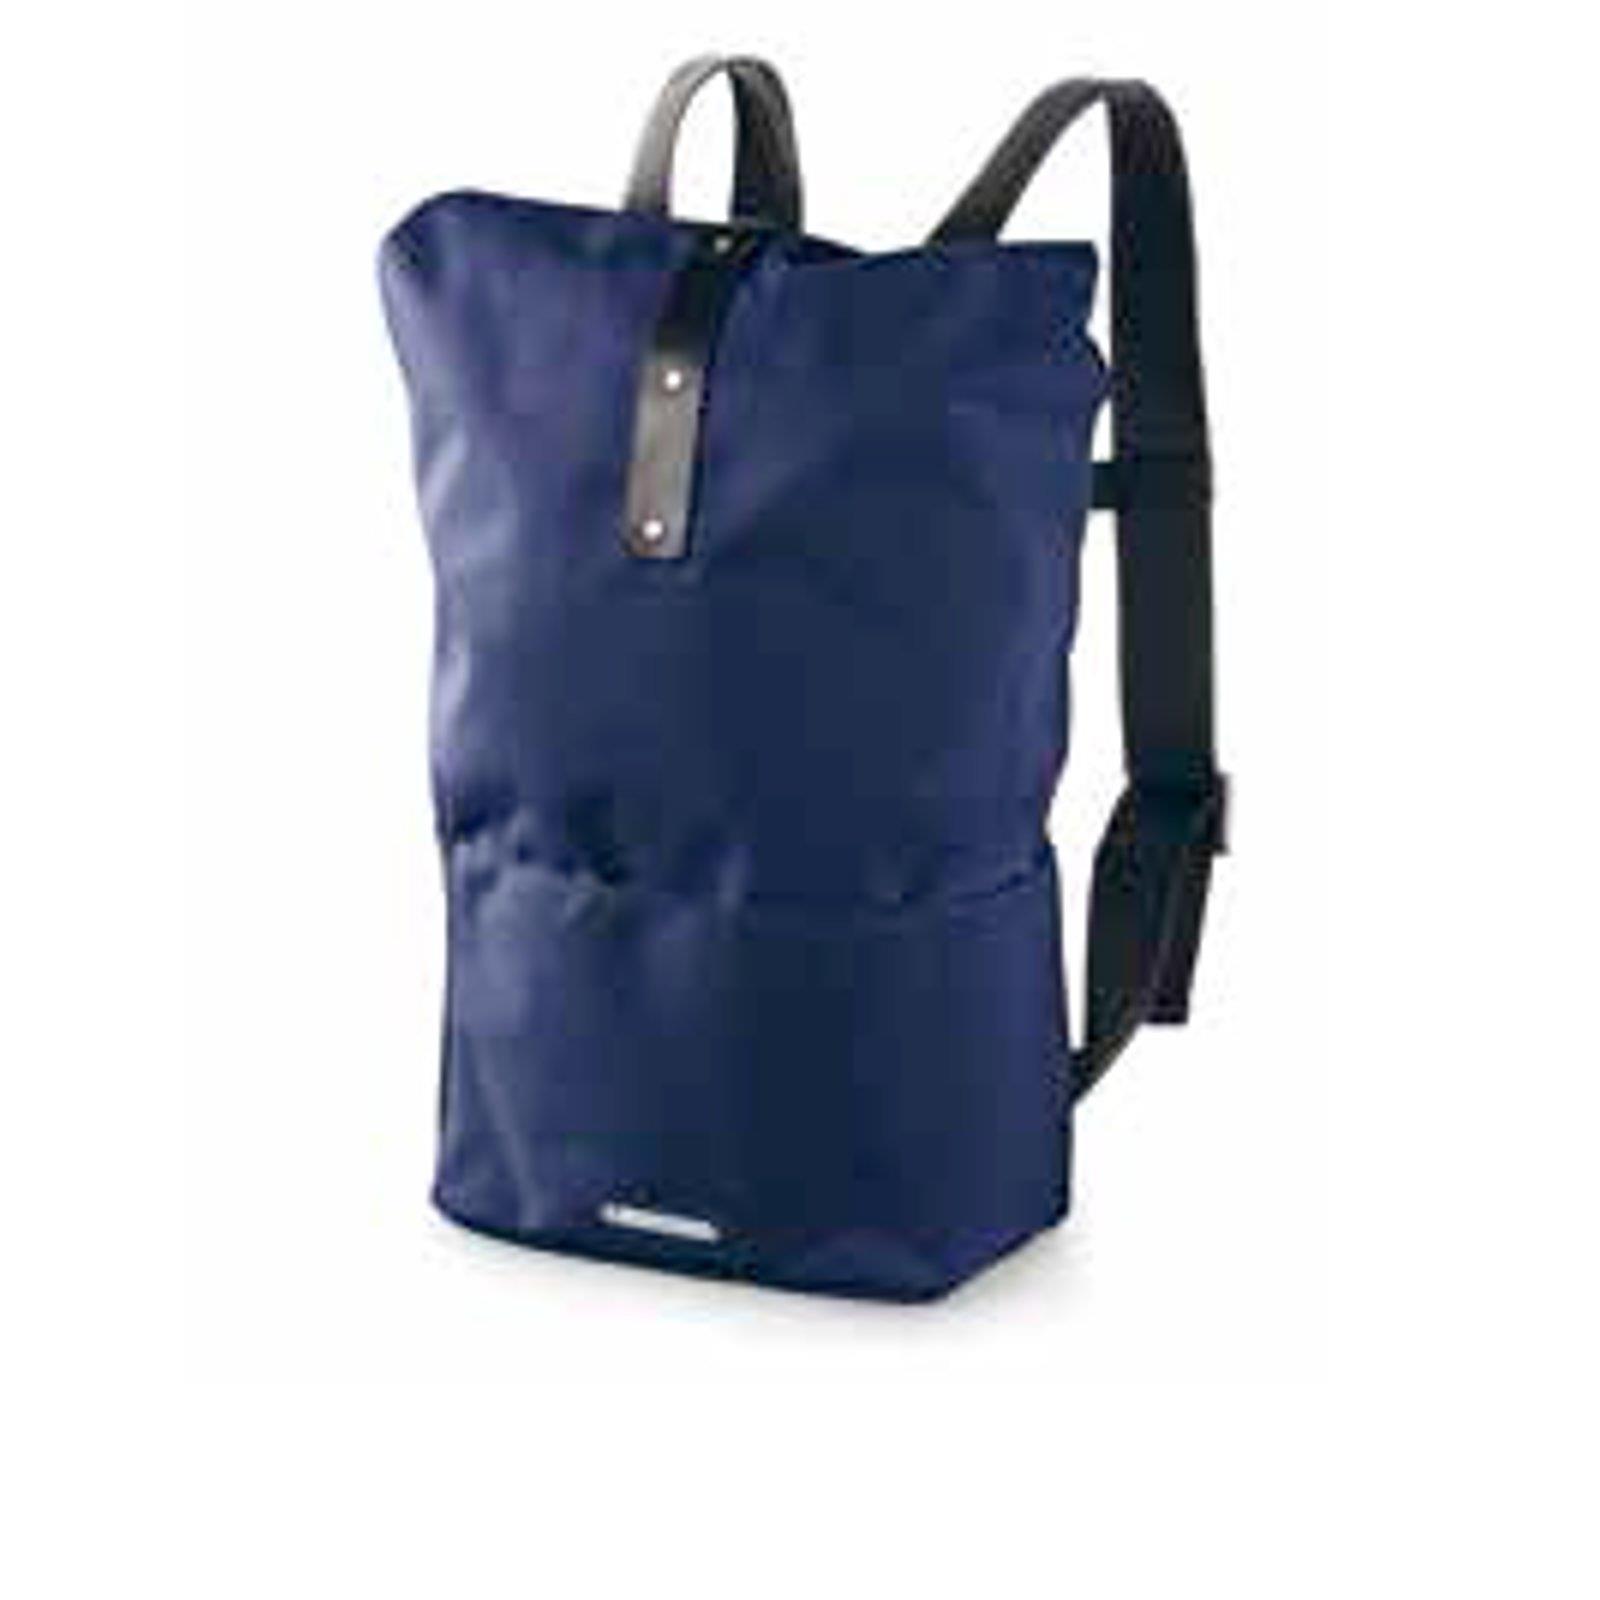 brooks hackney rucksack backpack fahrrad tasche notebook 15 zoll fahrradtasche ebay. Black Bedroom Furniture Sets. Home Design Ideas